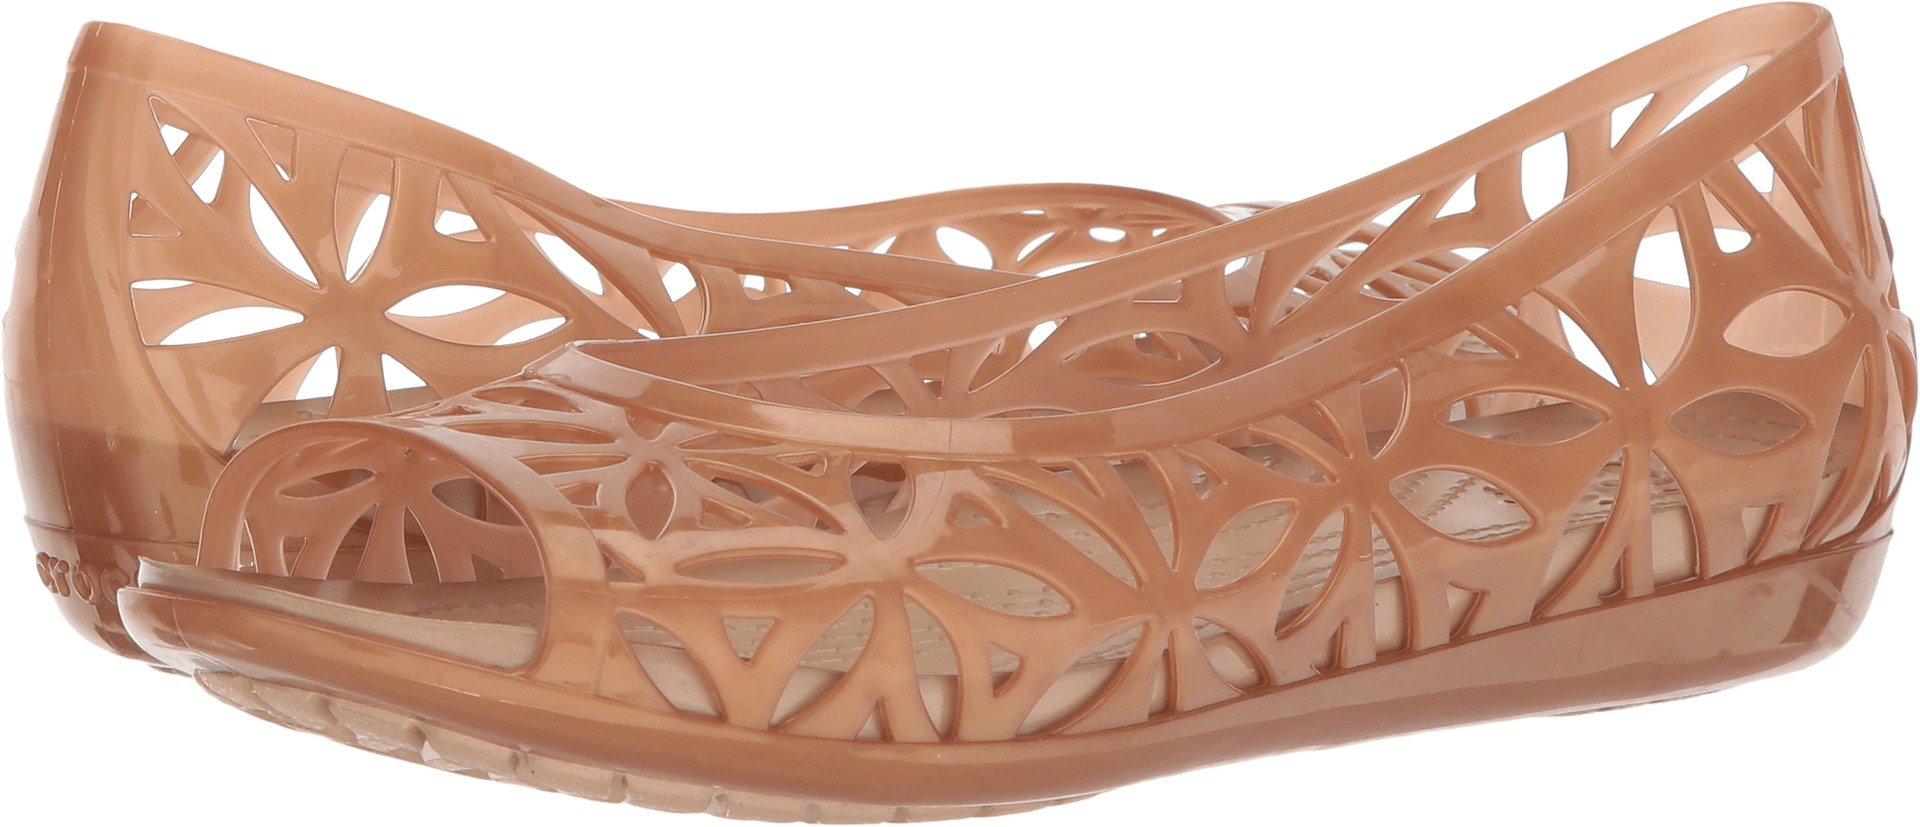 Crocs Women's Isabella Jelly II Flat W Sandal, Dark Gold/Gold, 8 M US